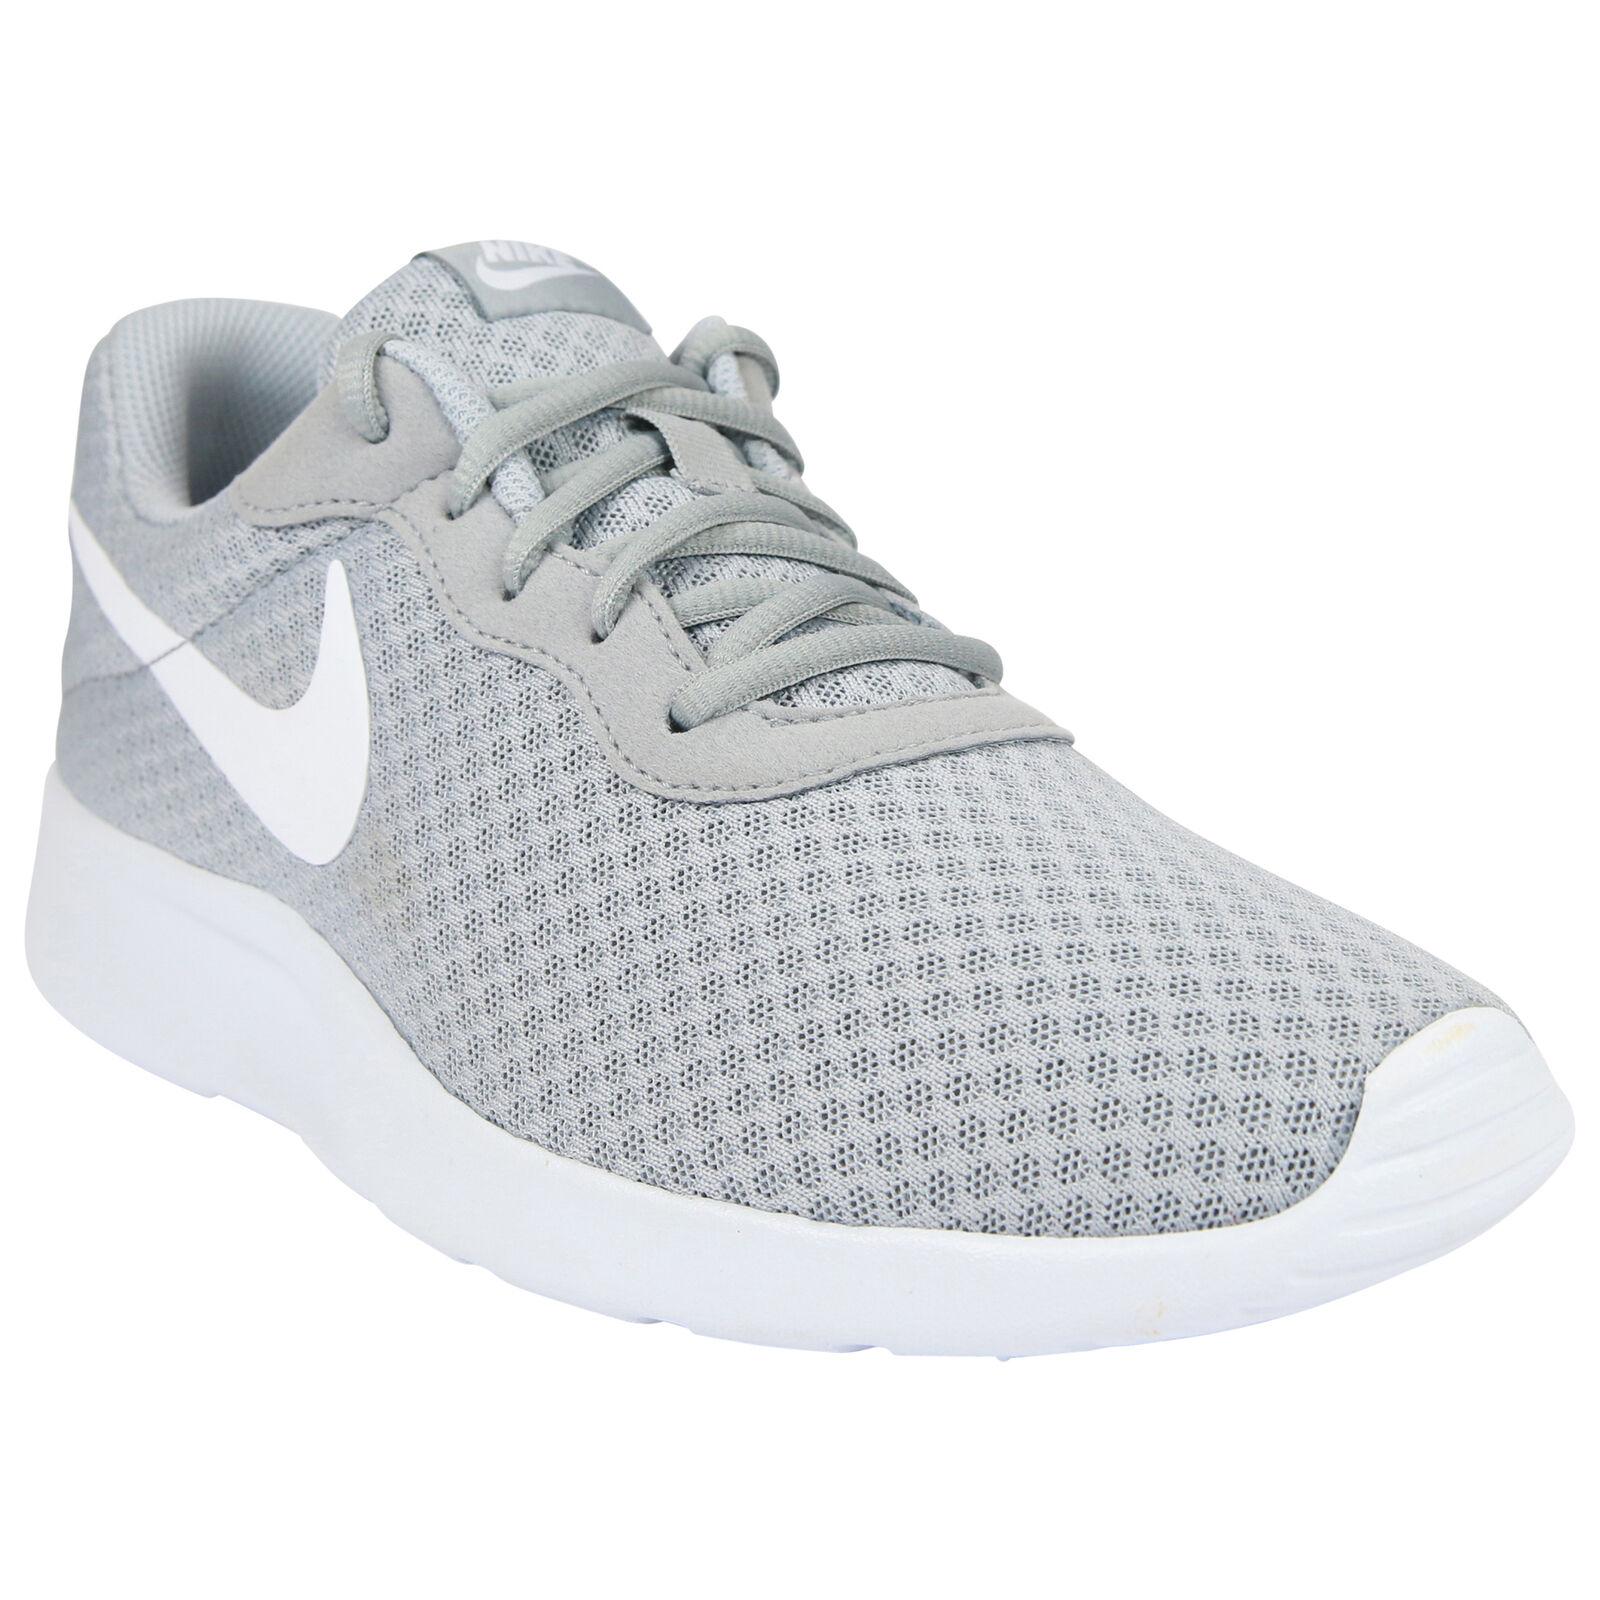 Nike Tanjun Wolf grau Herren